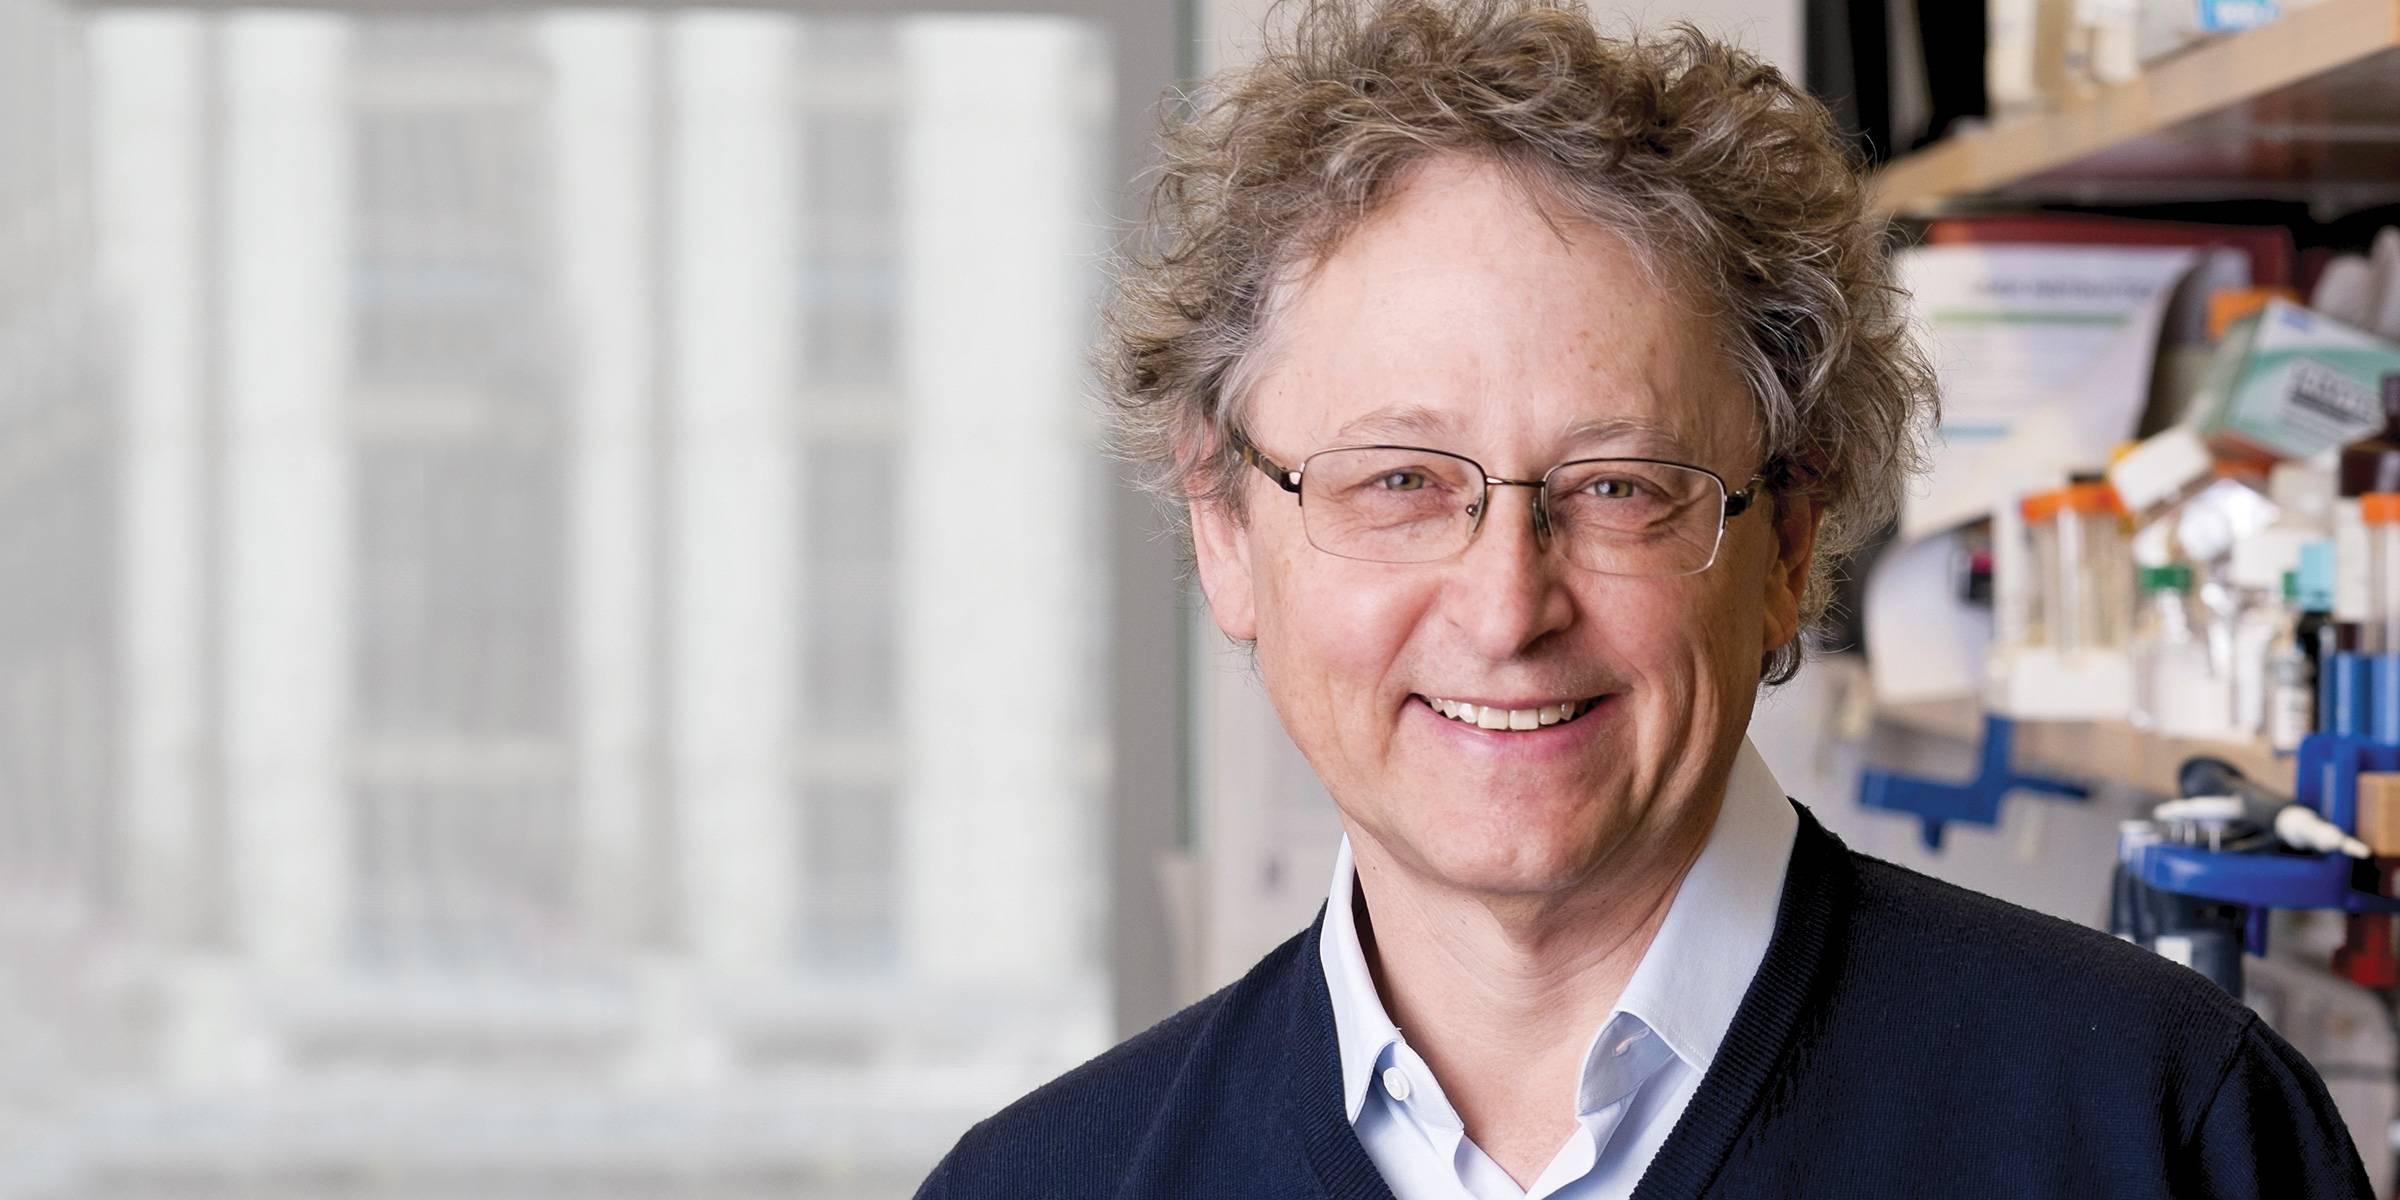 Michel C. Nussenzweig, M.D., Ph.D.